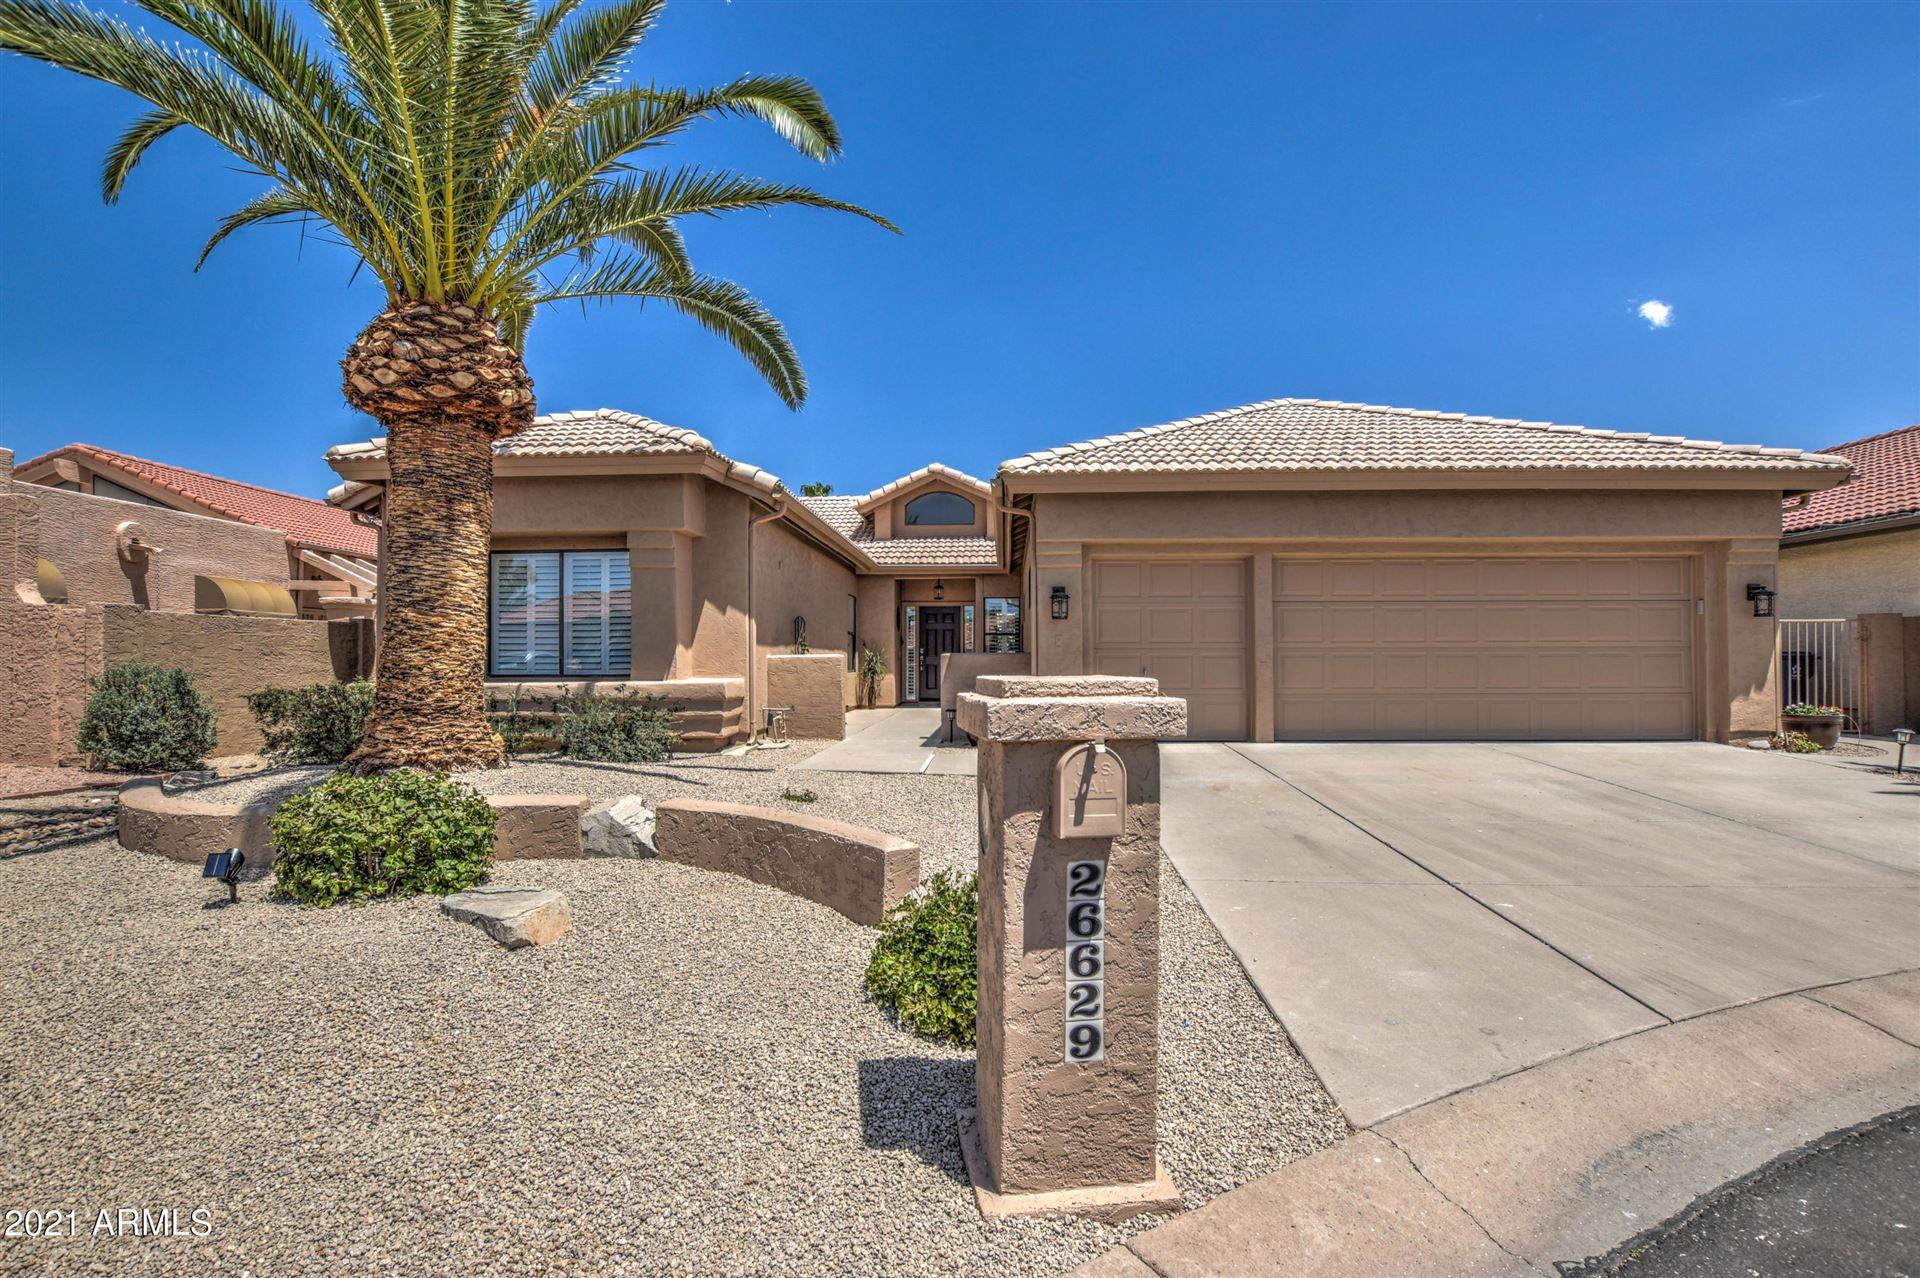 Photo of 26629 S QUEEN PALM Court, Sun Lakes, AZ 85248 (MLS # 6229748)